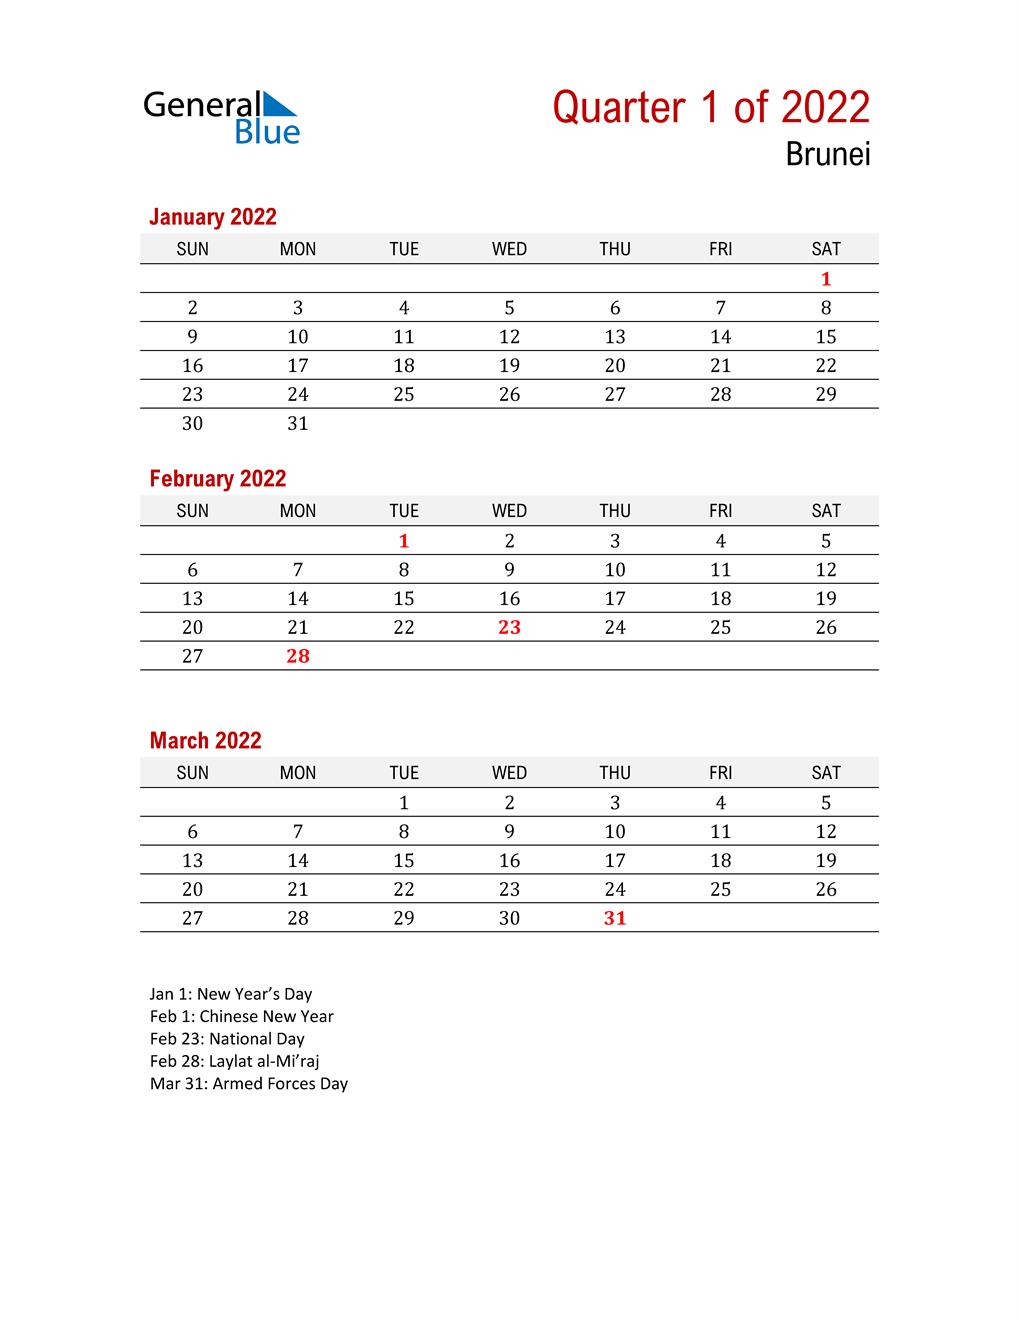 Printable Three Month Calendar for Brunei